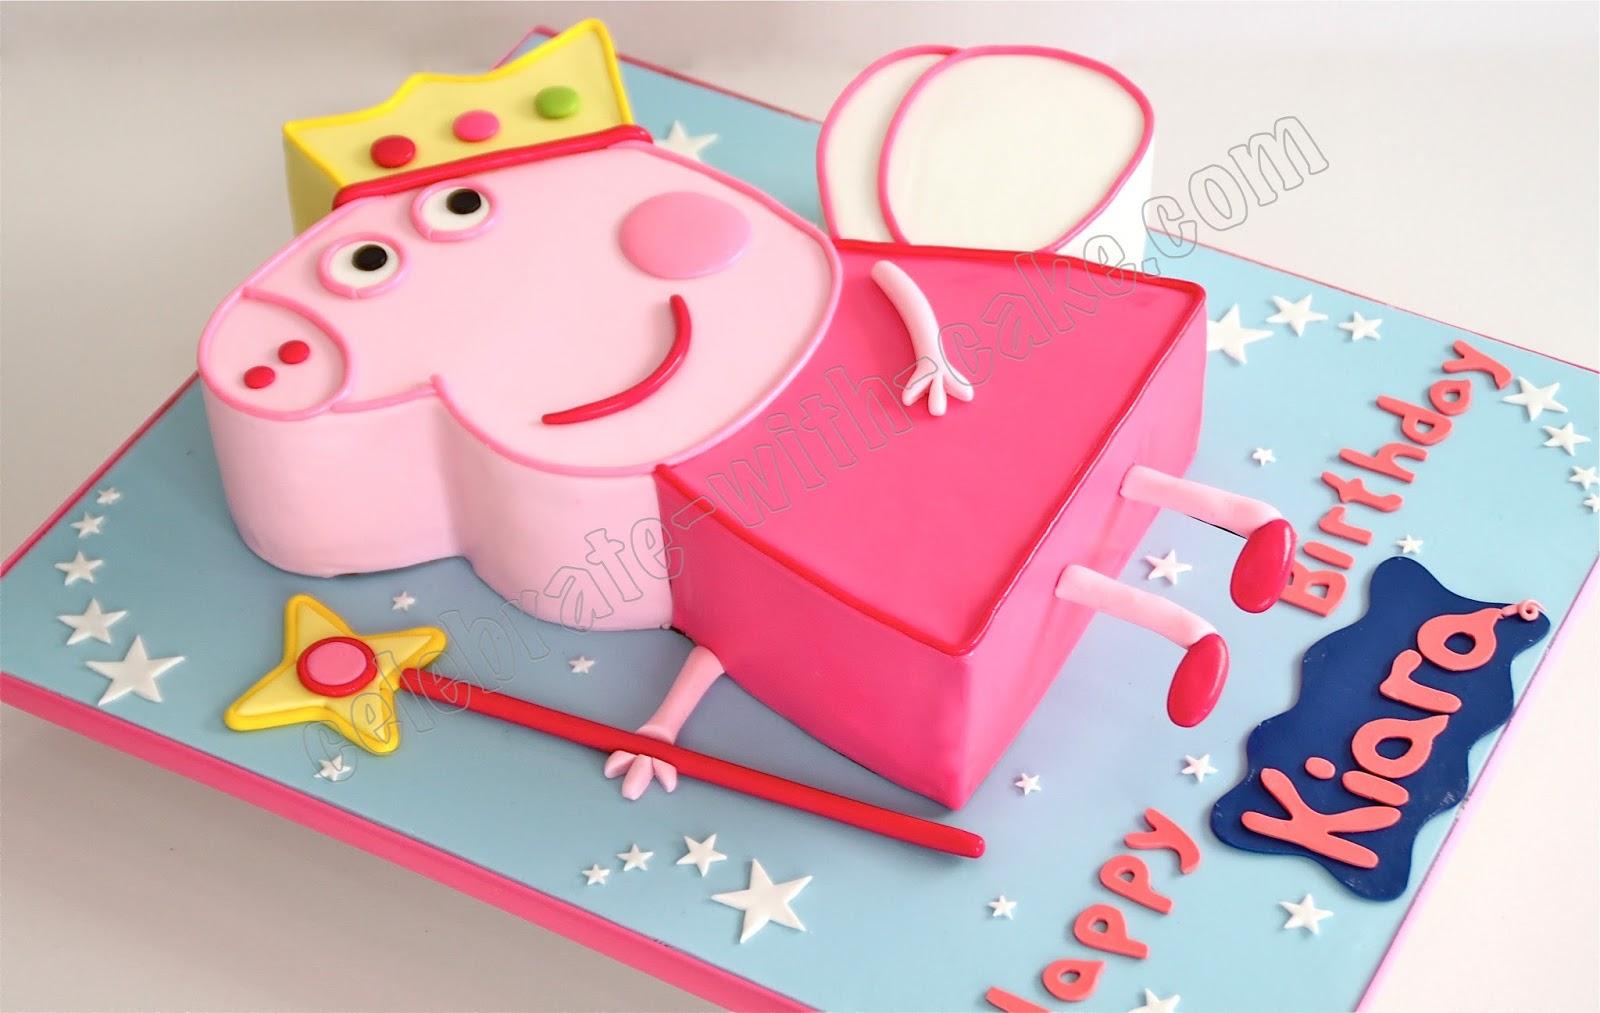 Celebrate with cake fairy princess peppa pig cake for Peppa pig cake template free